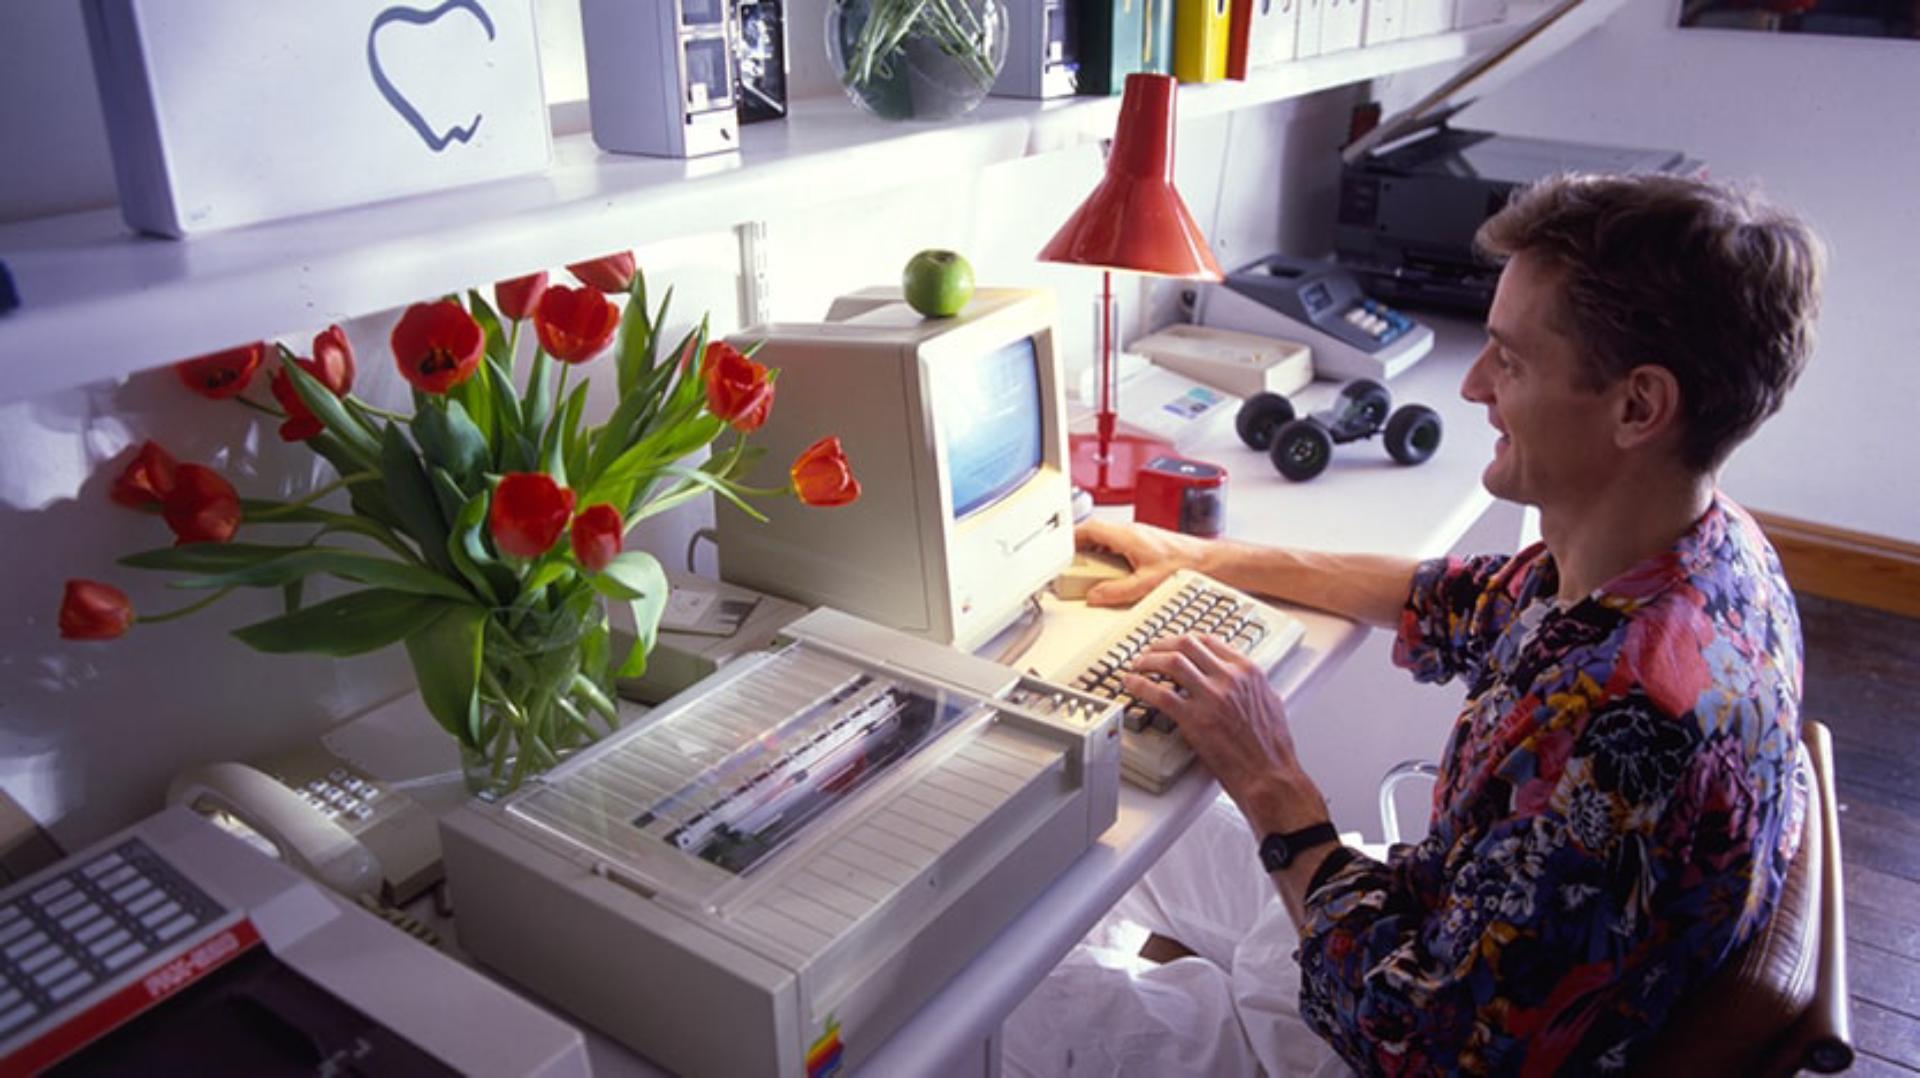 James Dyson working in front of desktop computer in Japan